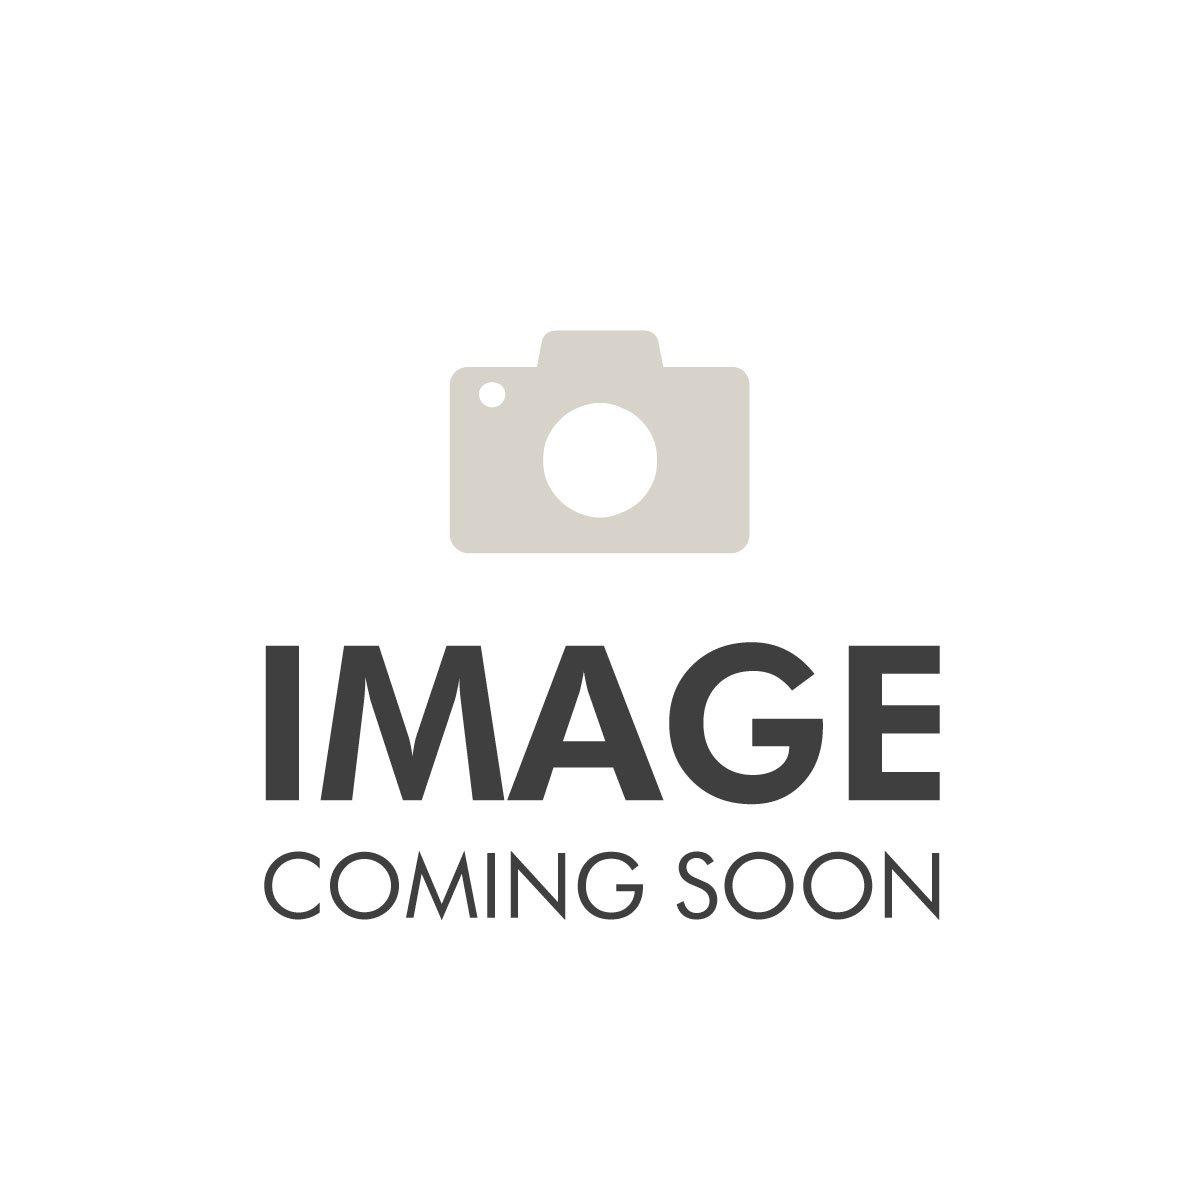 Clarins Skin Illusion Loose Powder Foundation 110 Honey